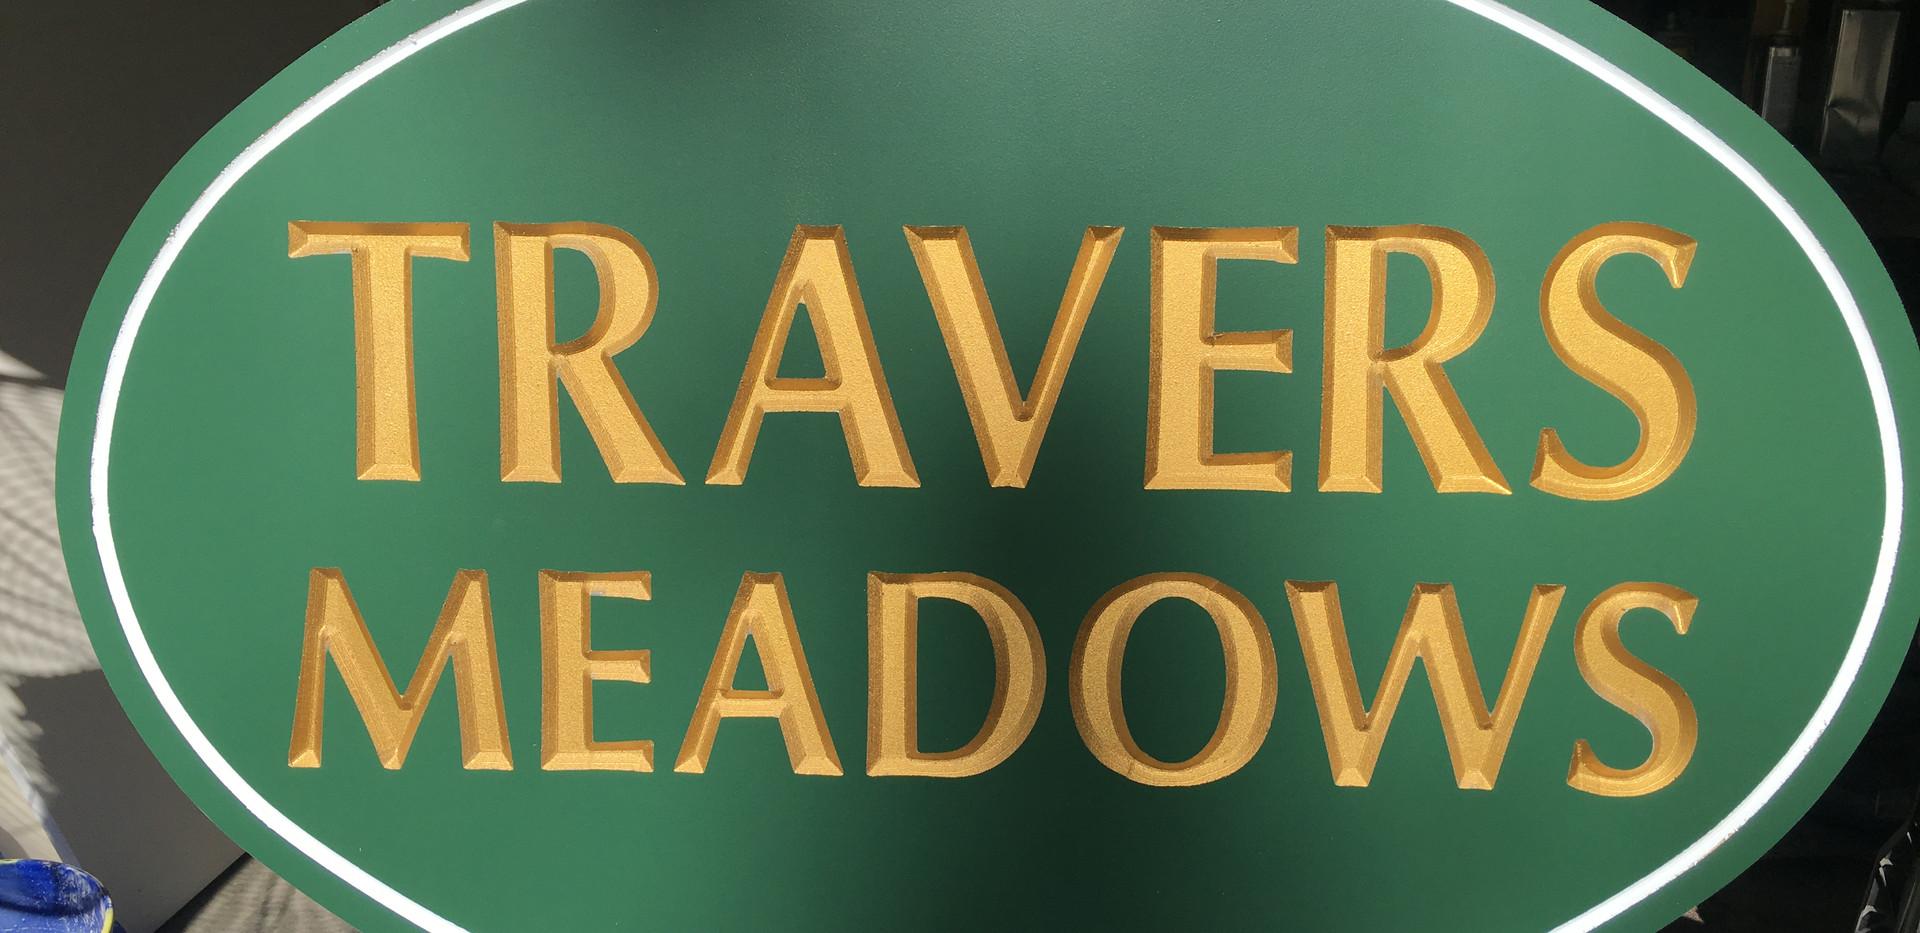 Travers Meadows